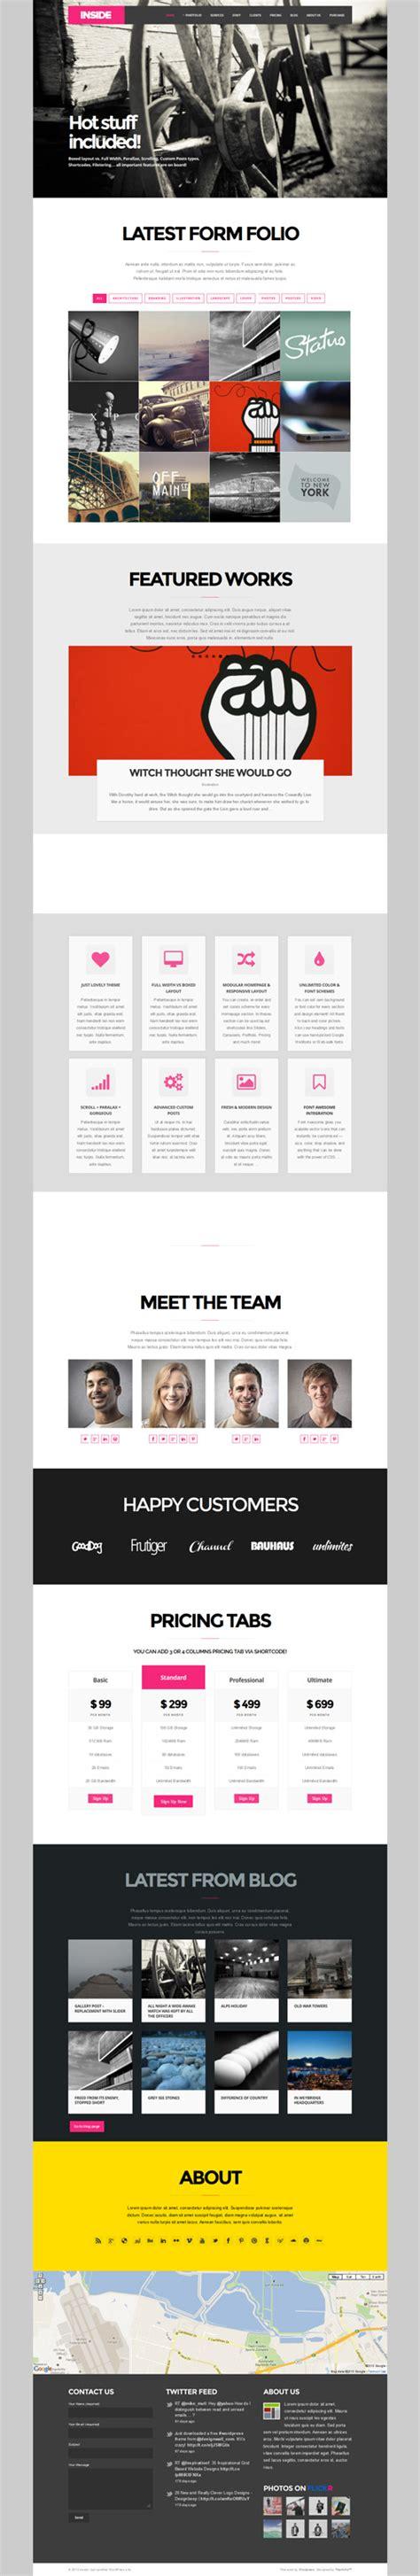 layout inside wordpress new wordpress themes modern responsive design